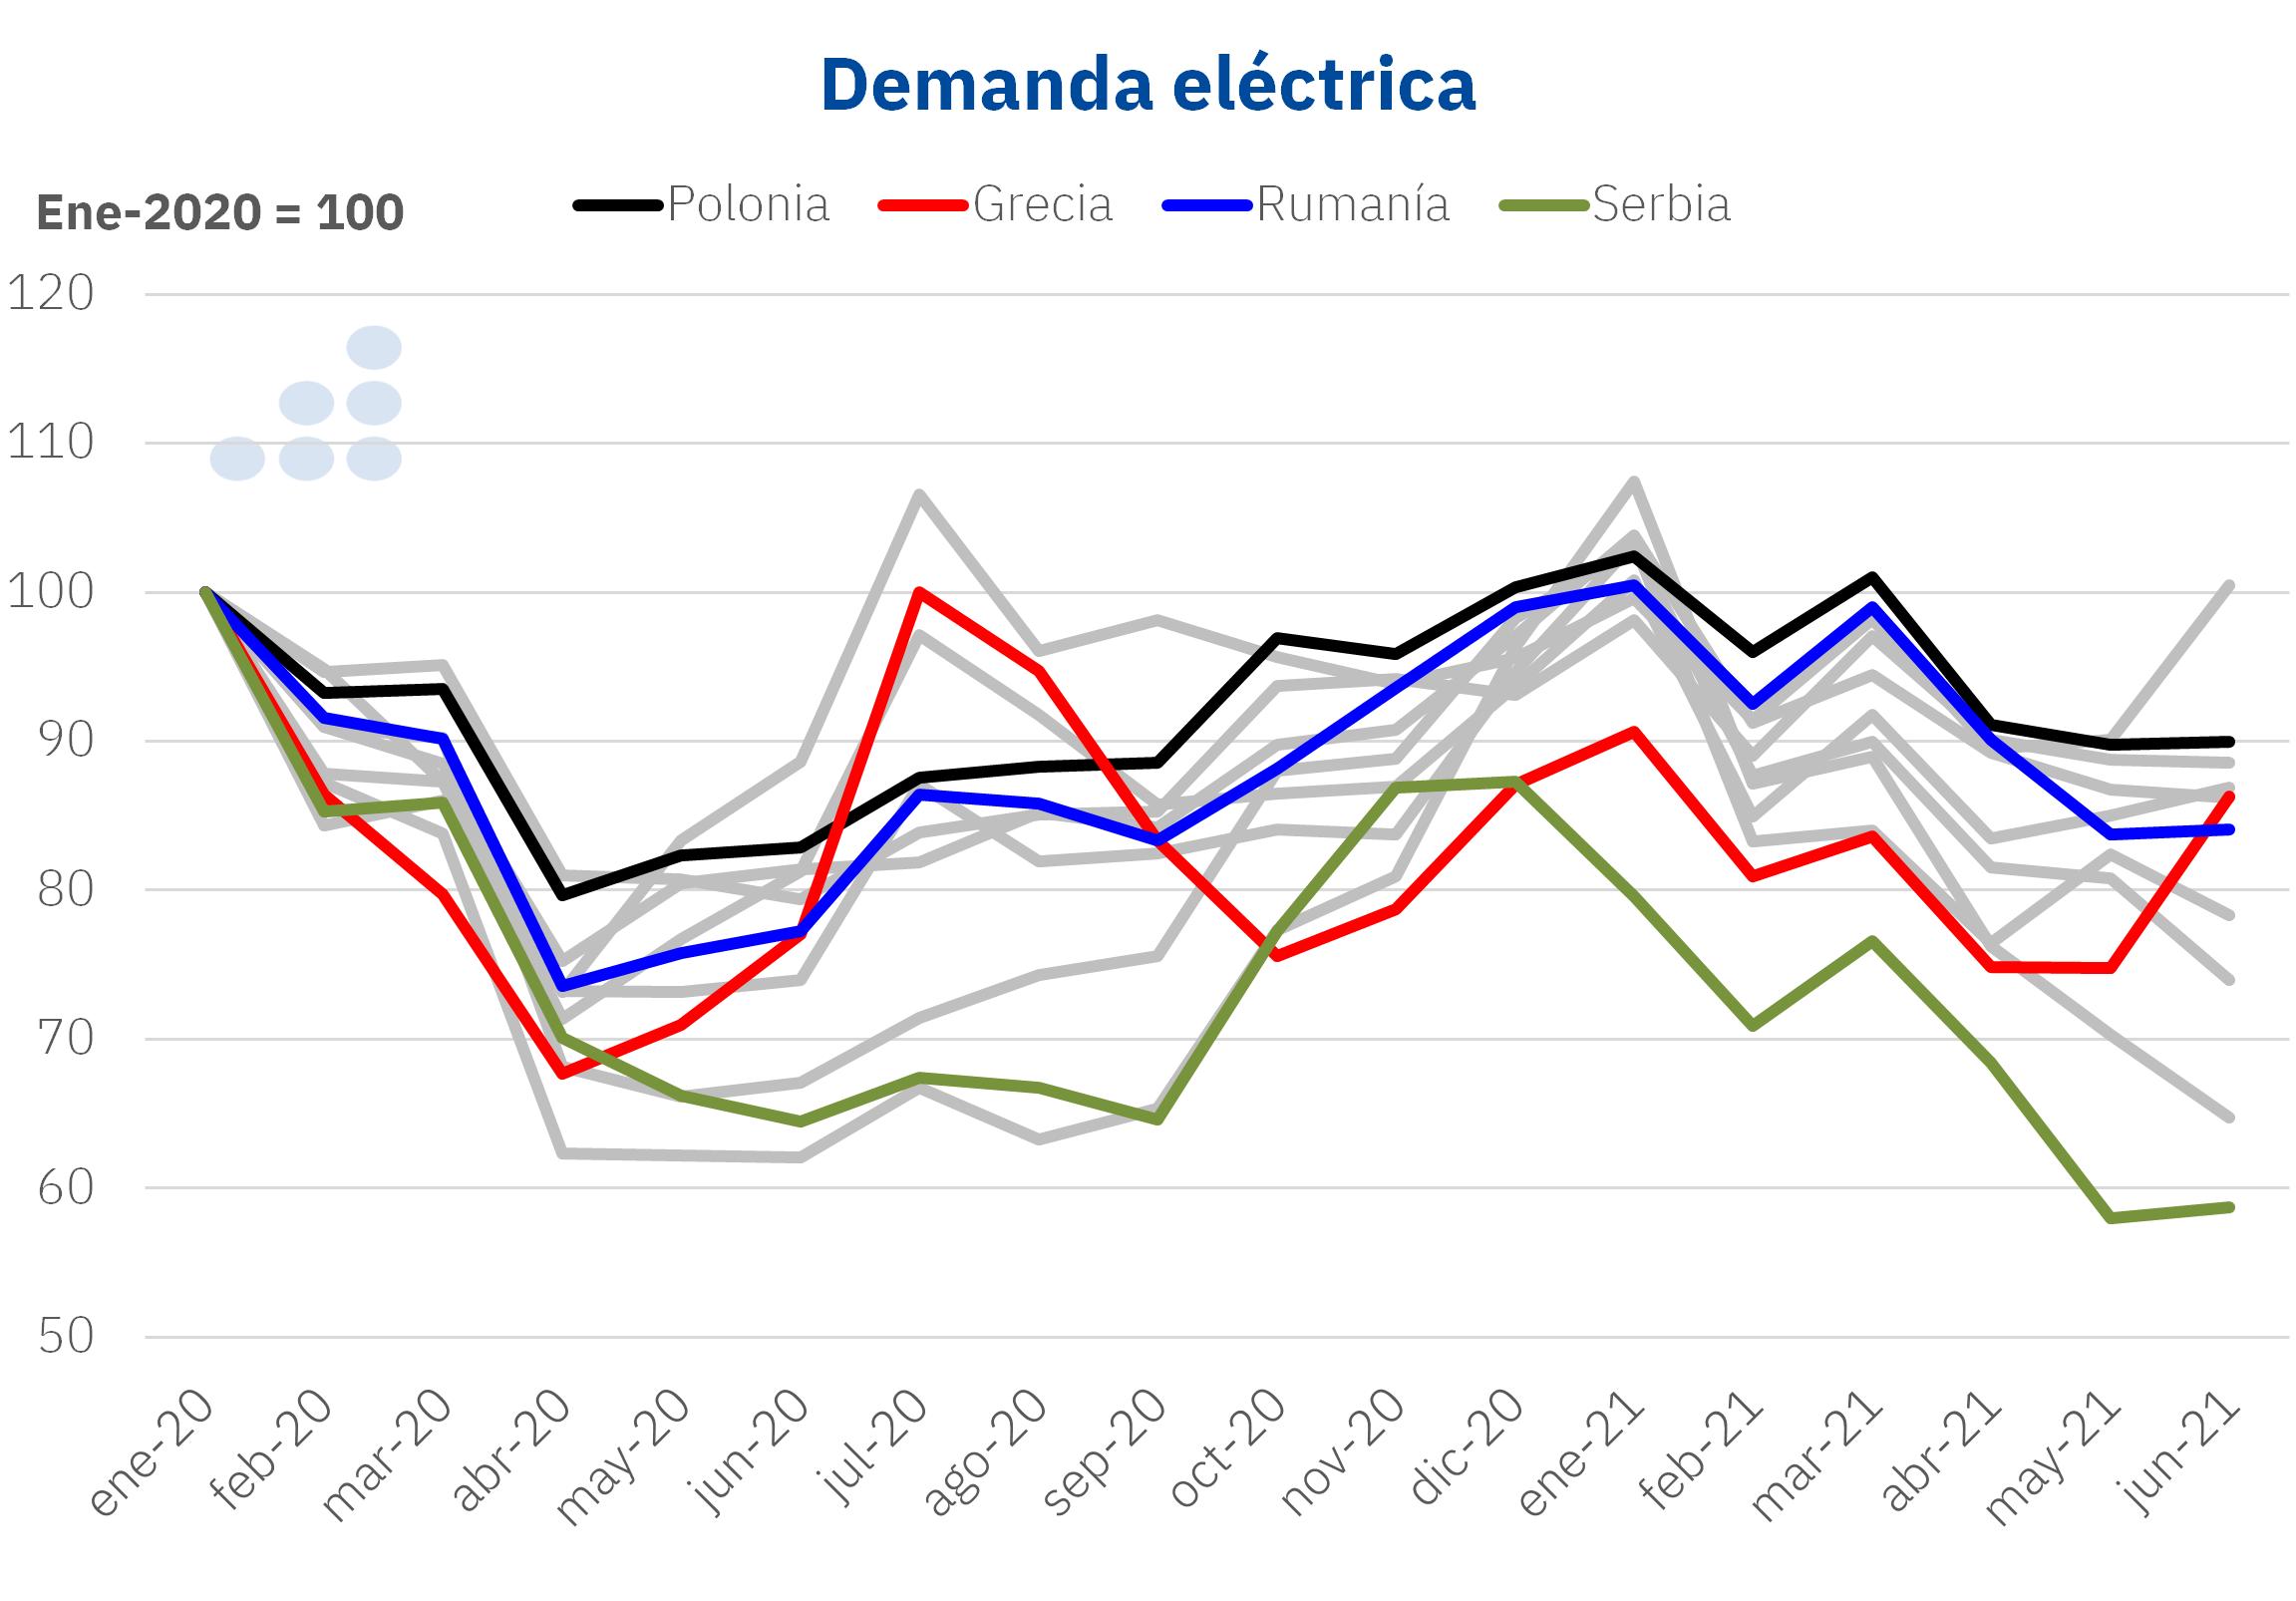 AleaSoft - demanda electrica polonia grecia rumania serbia